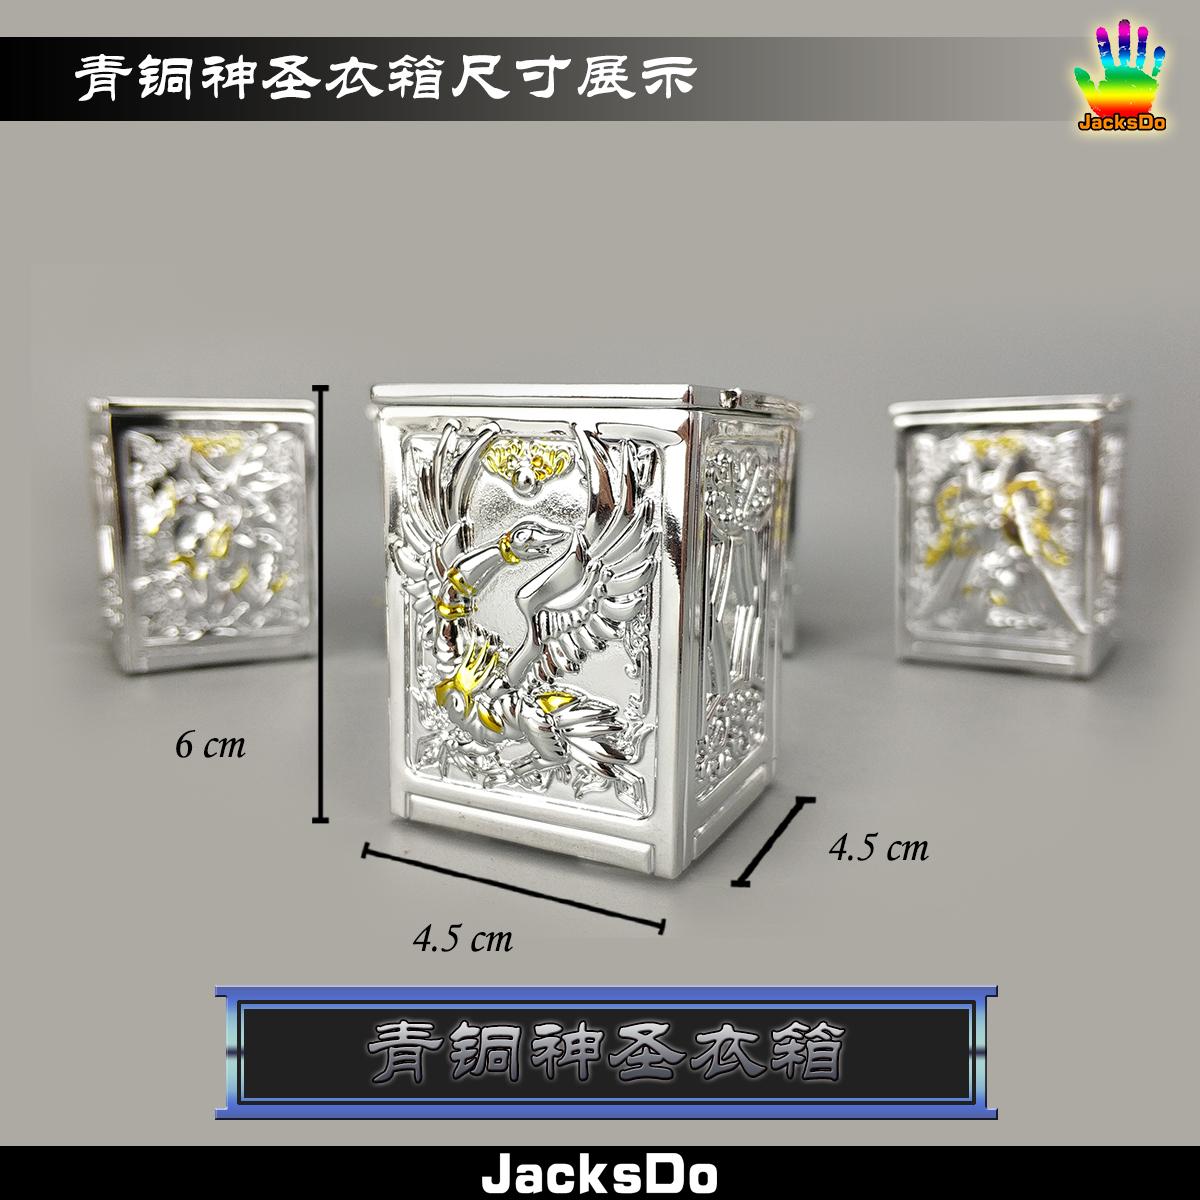 JacksDo_box_bronze_5_roki_inask_031.jpg